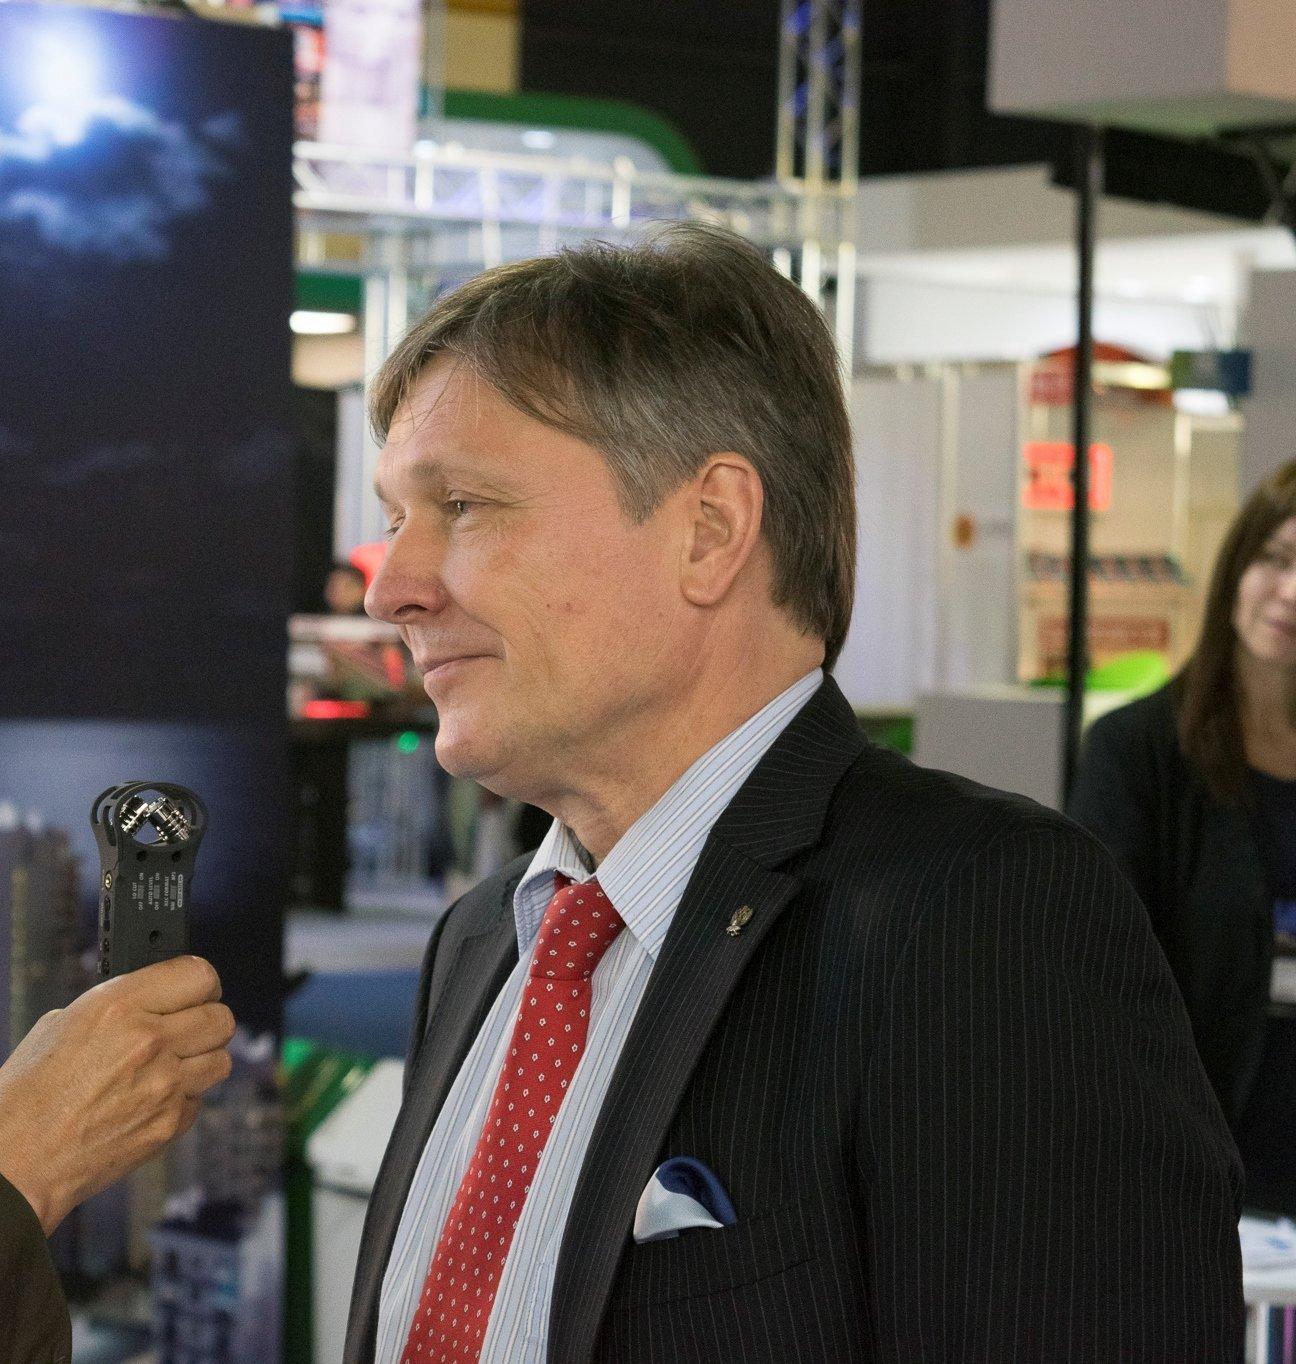 El embajador de Rusia en Argentina, Viktor Koronelli